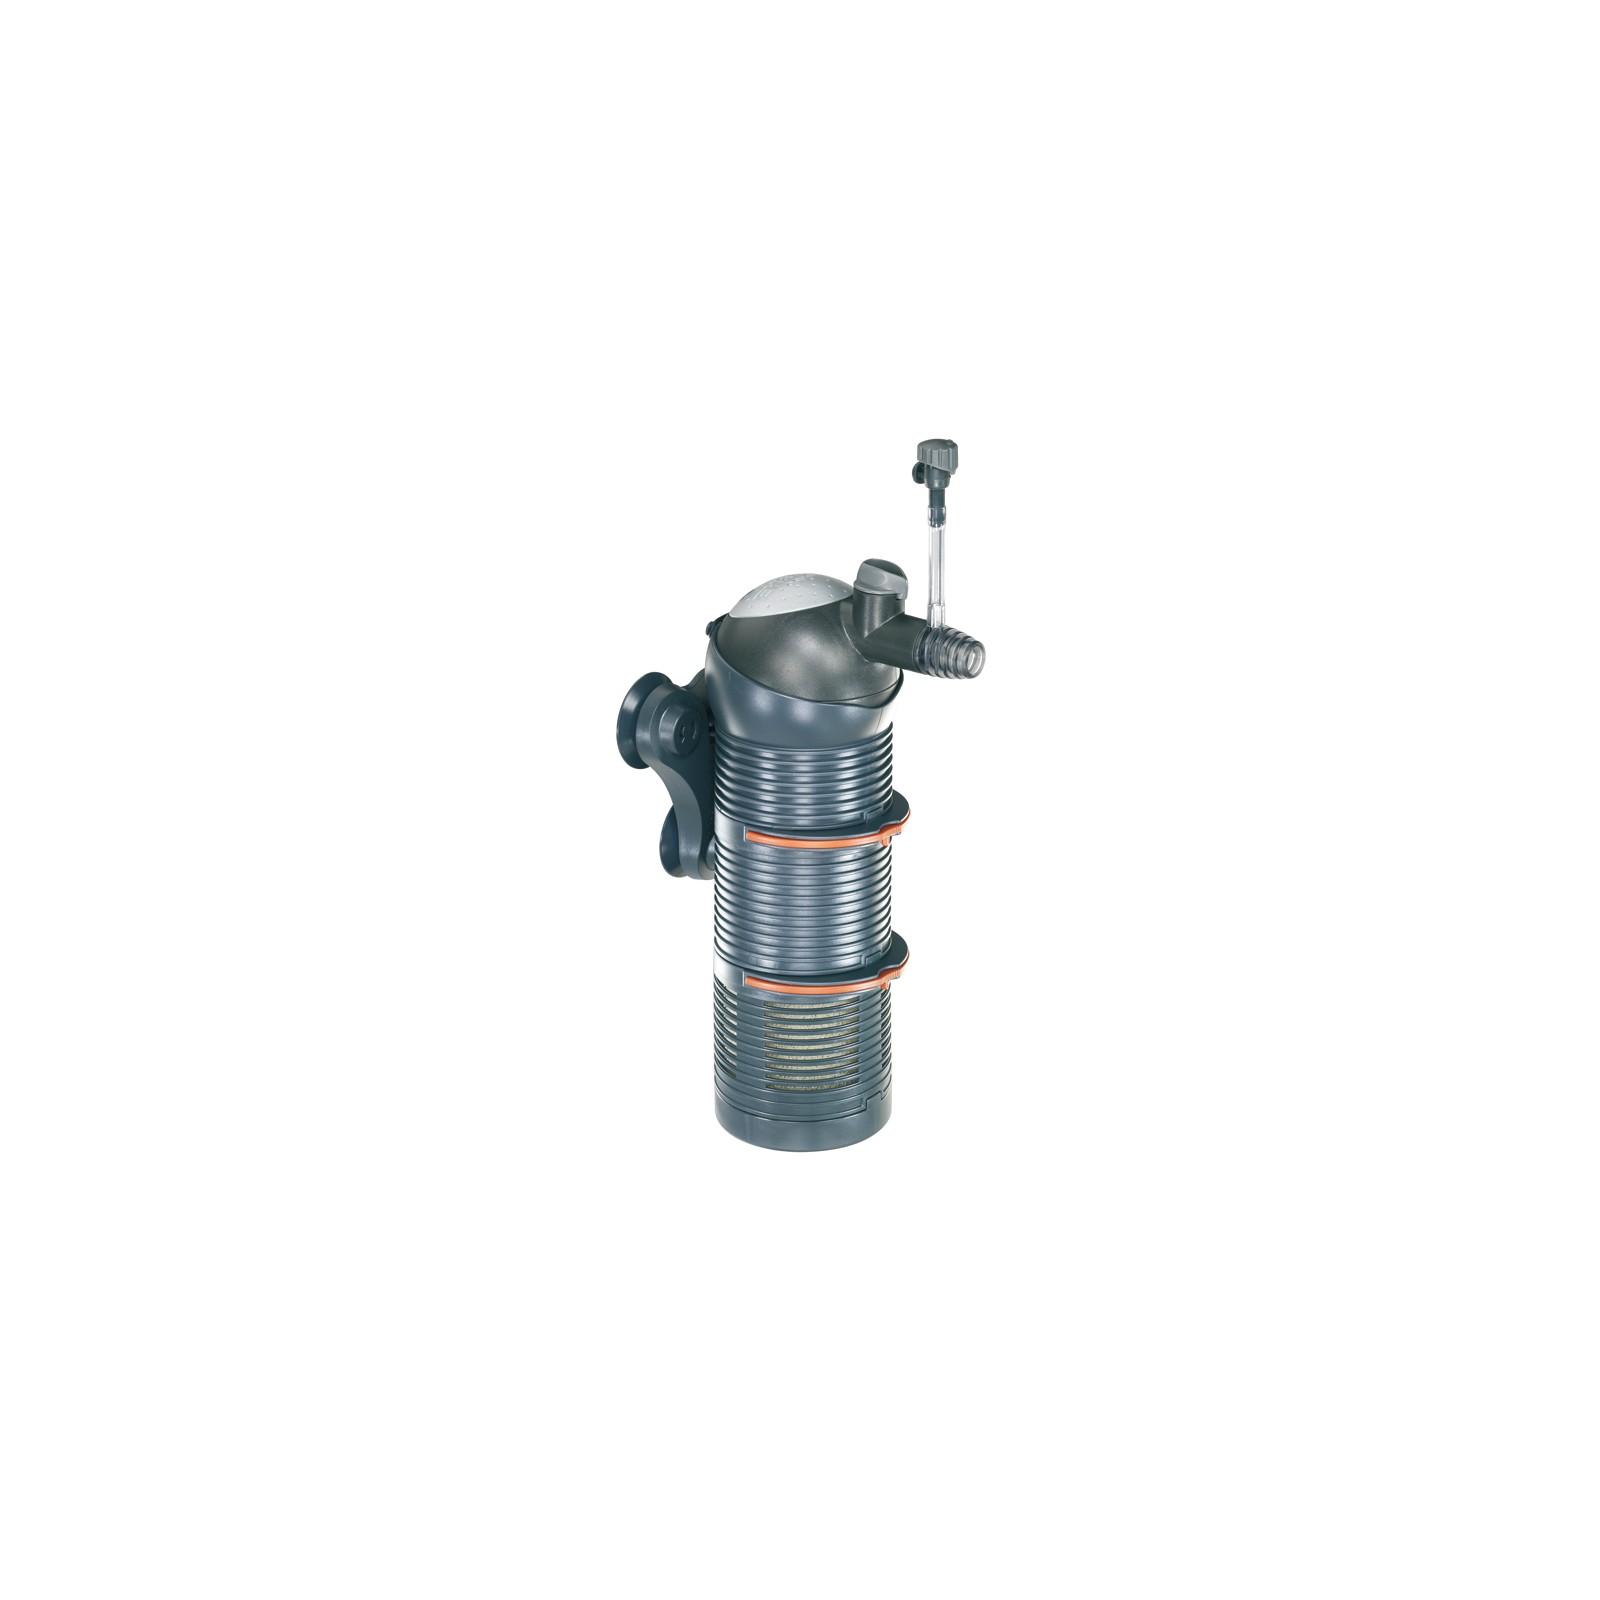 Eheim Biopower 160 (2411) vnitřní filtr